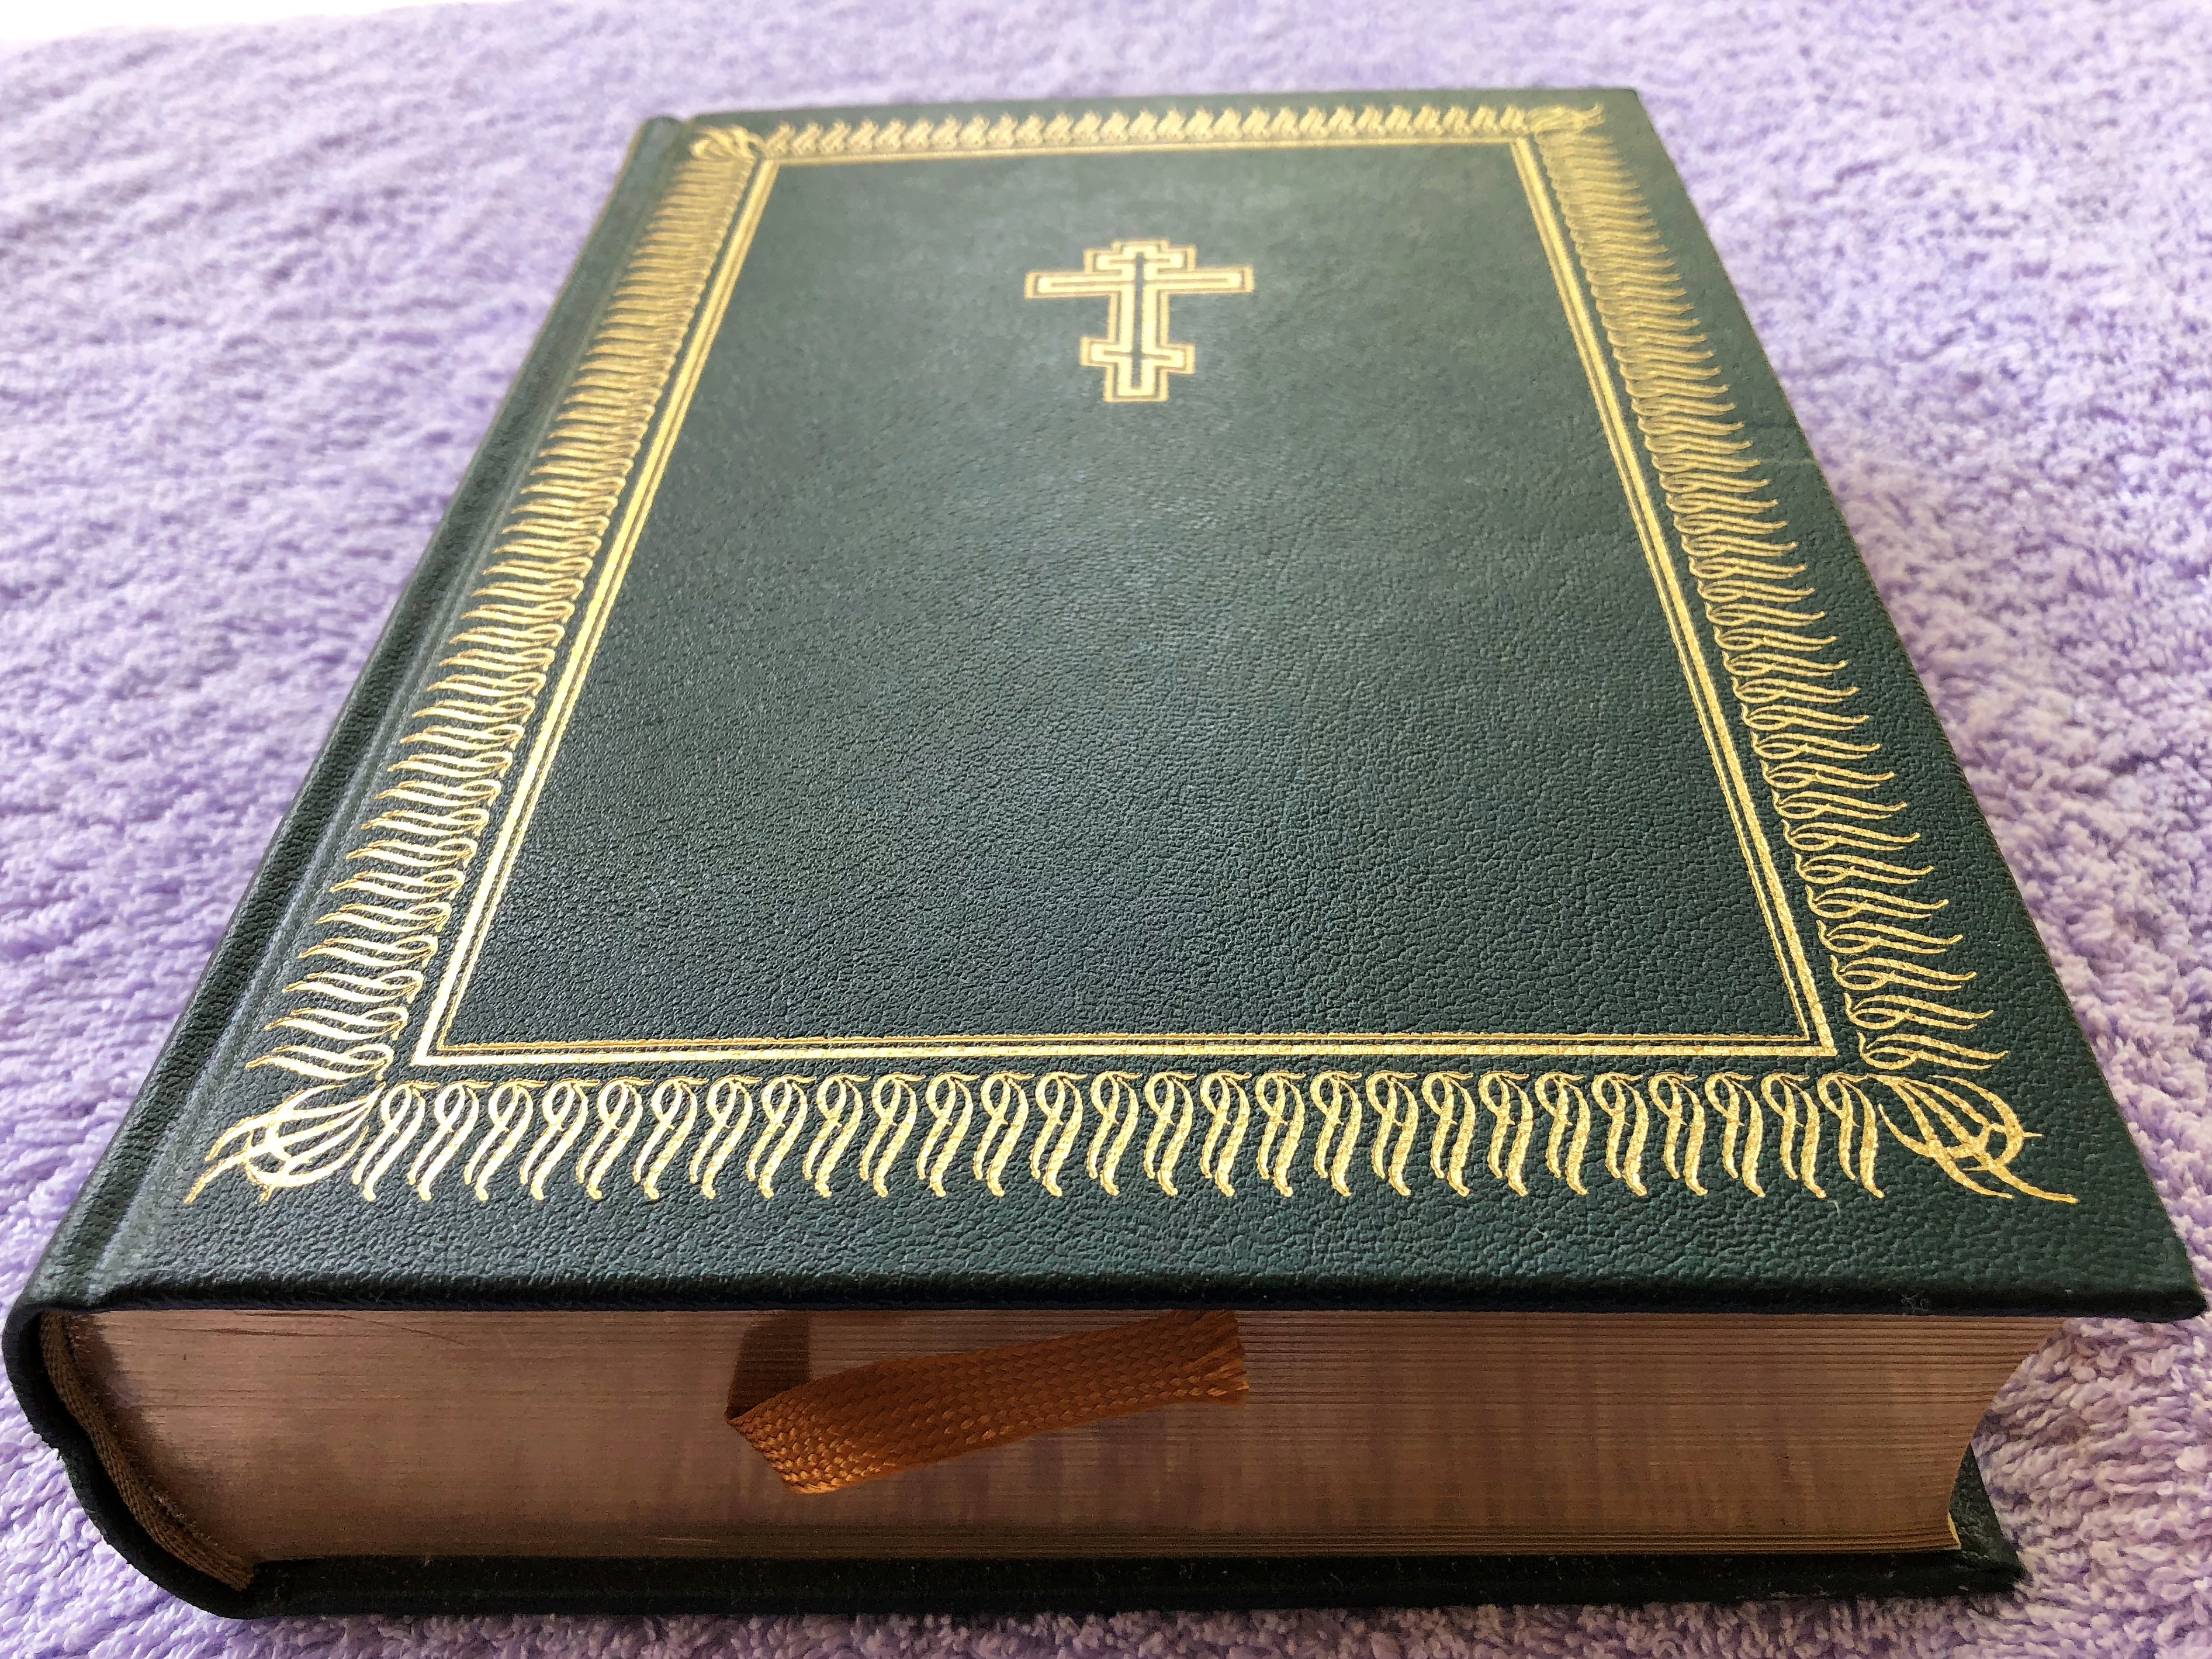 old-church-slavic-bible-beautiful-luxury-leather-bound-bible-green-4-.jpg